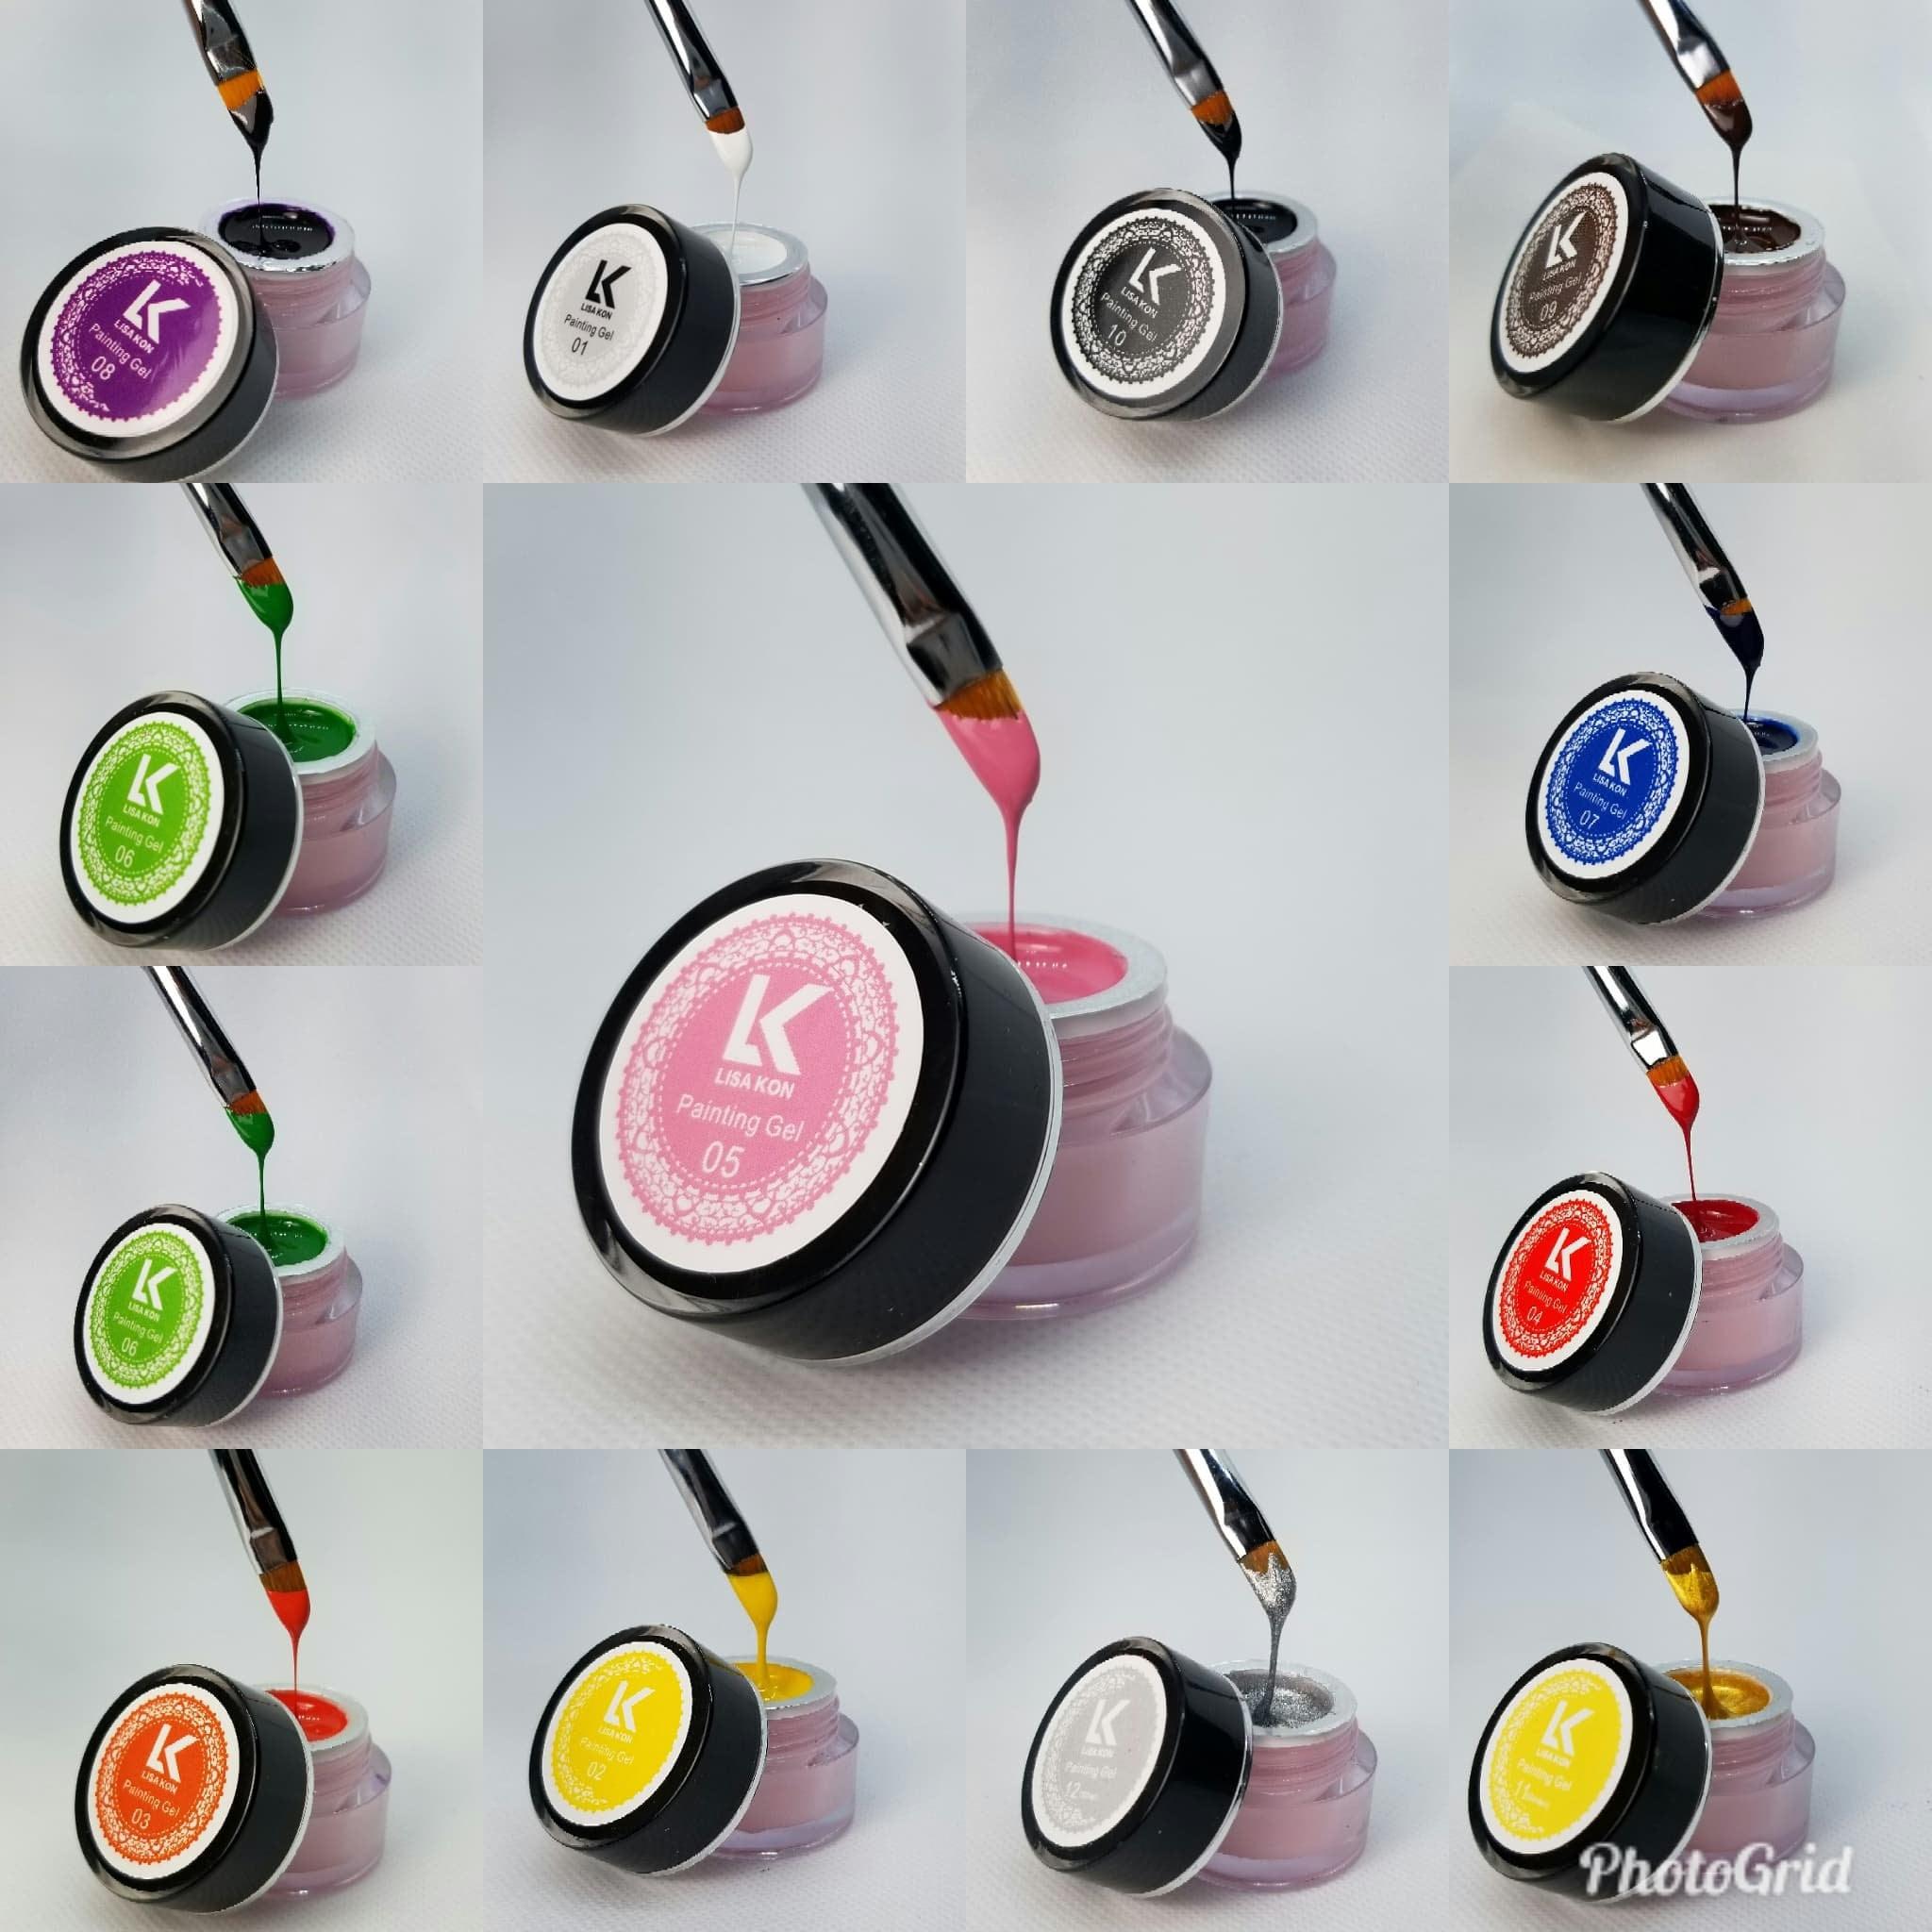 Painting nail art gel Lisa Kon 8ml 12 colors art brushes